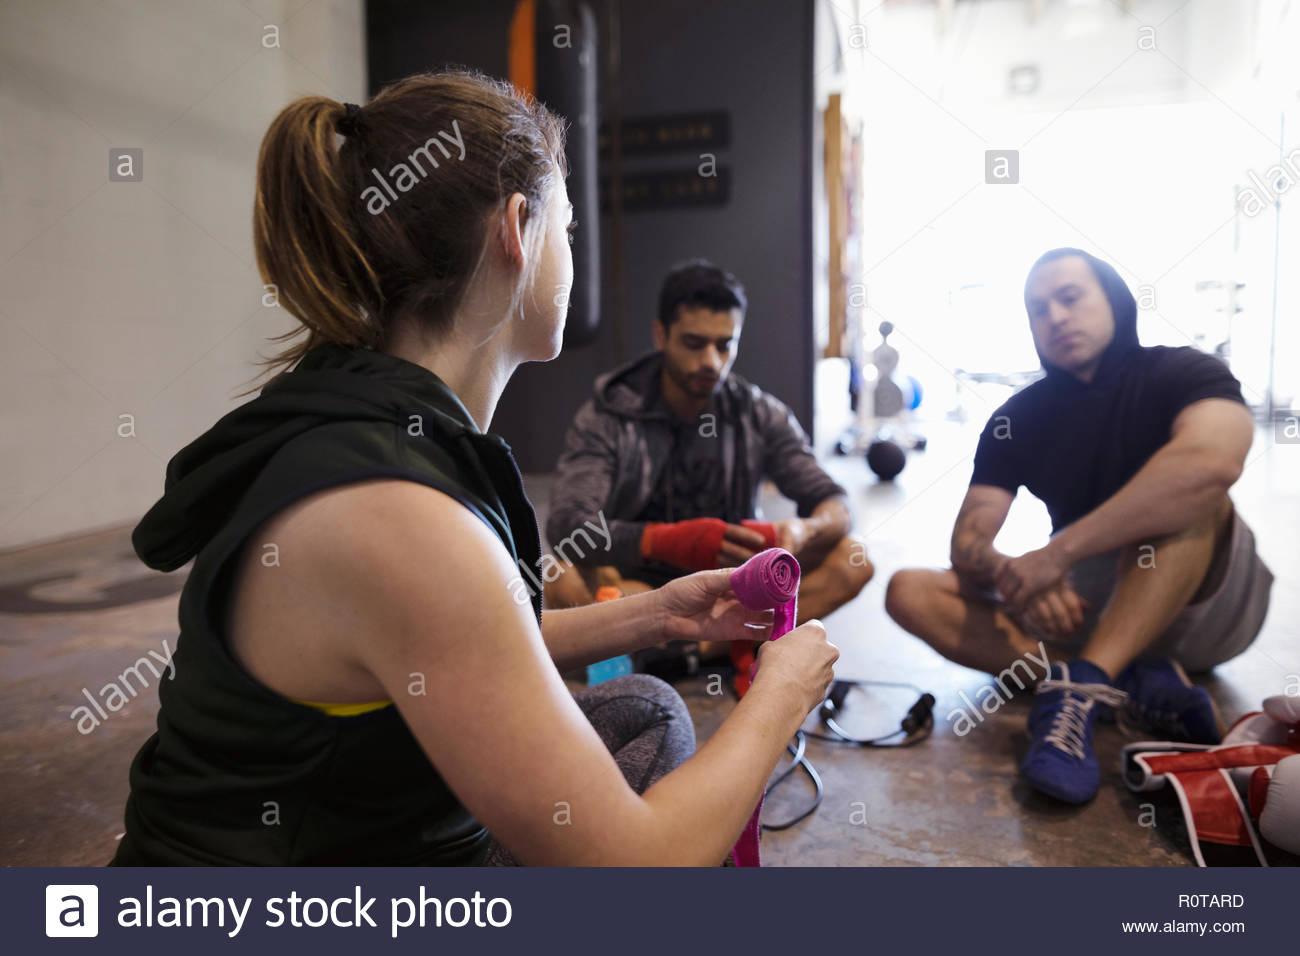 Boxers preparing in gym - Stock Image